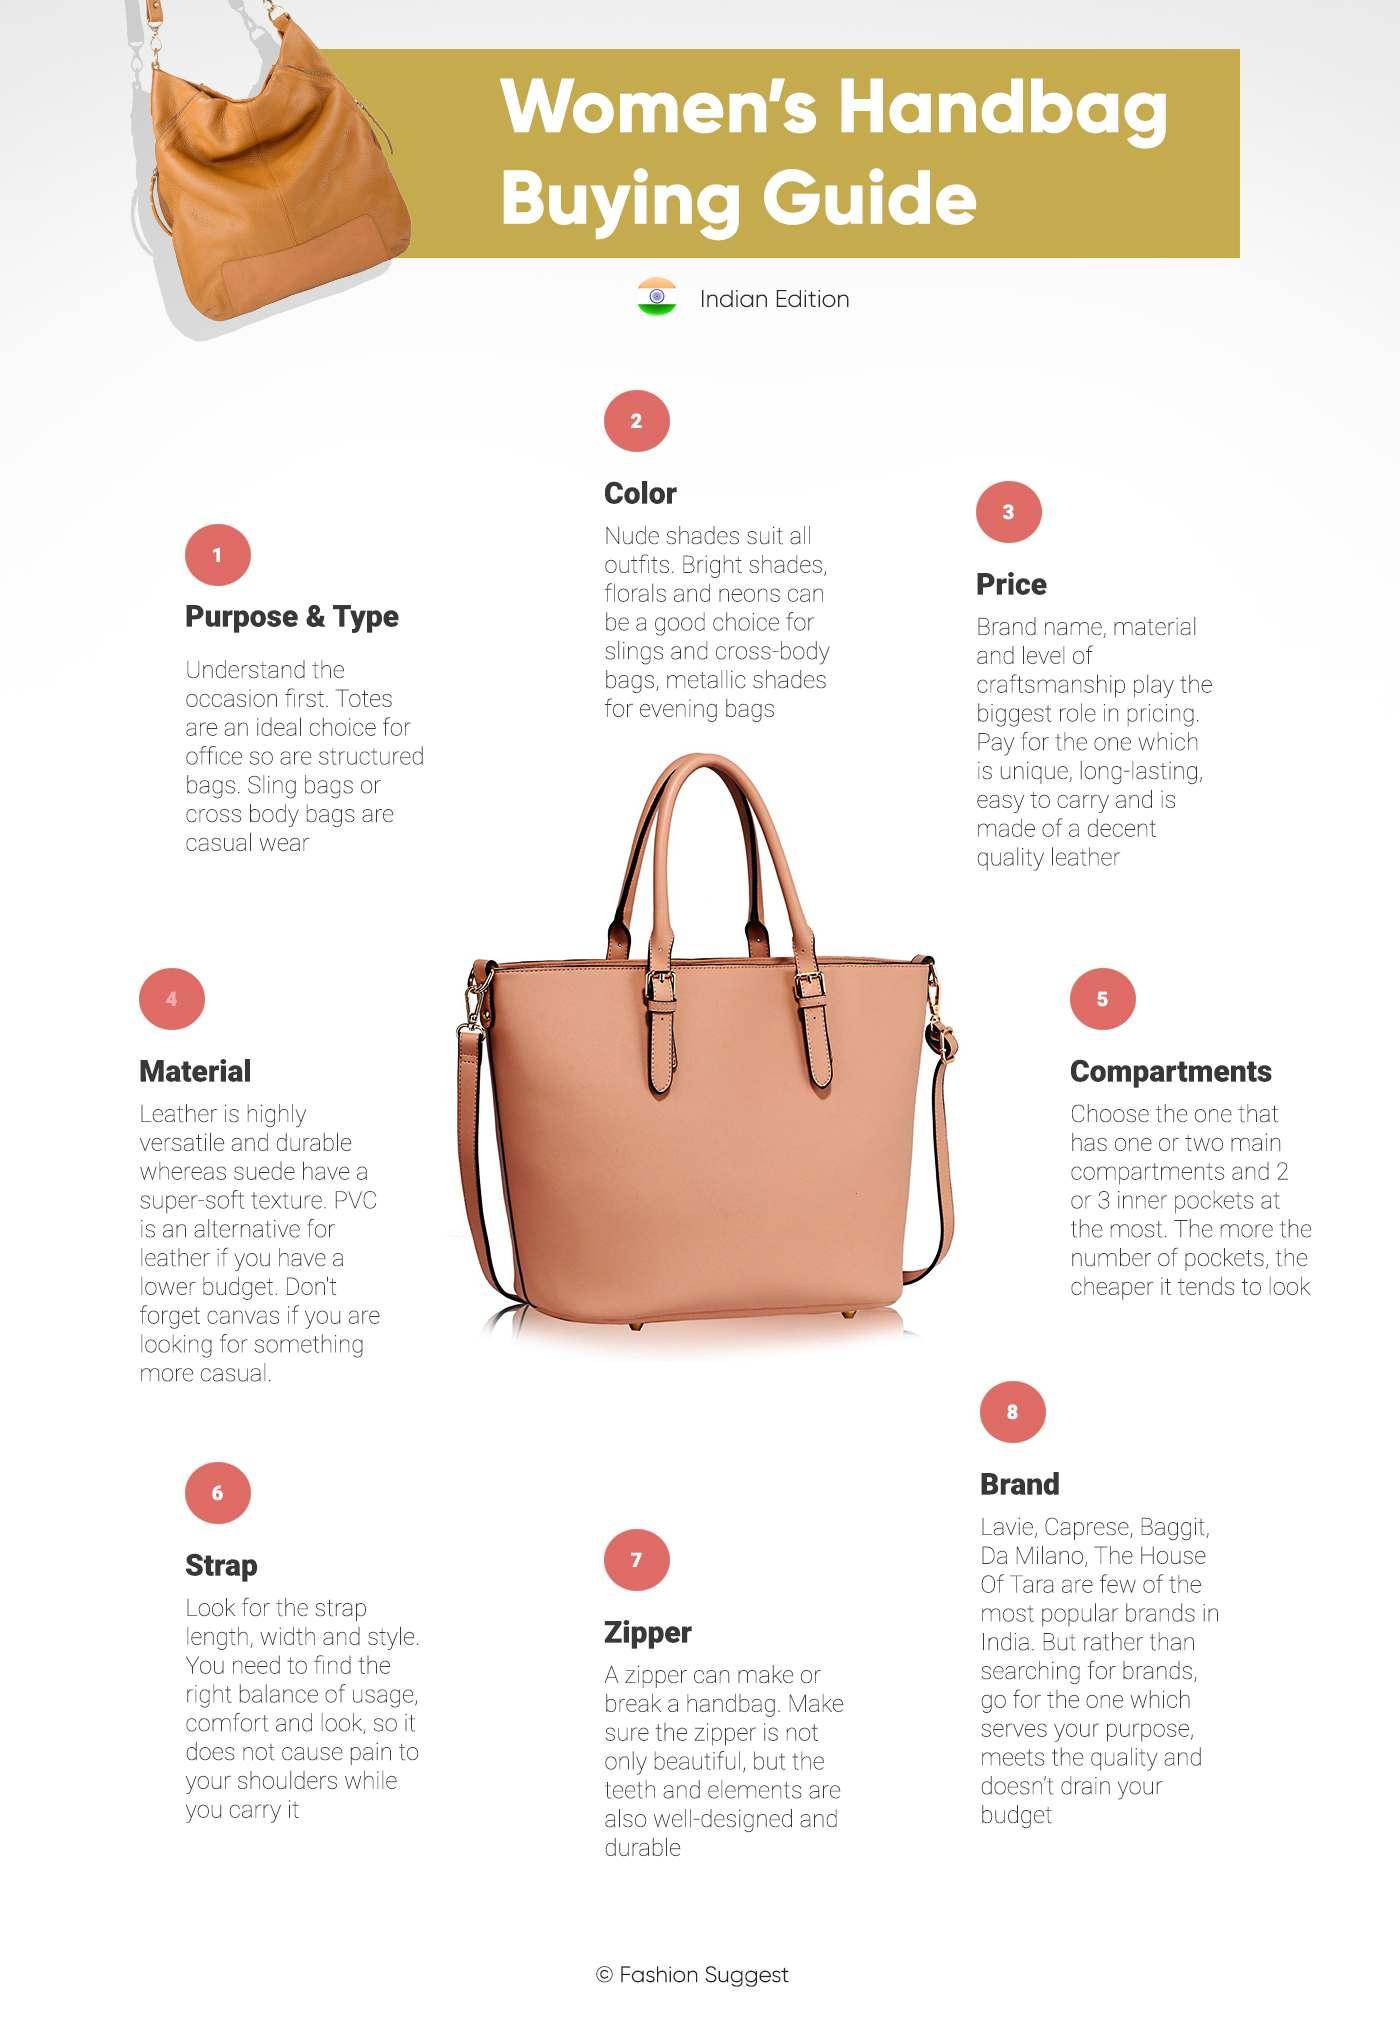 womens handbag buying guide infographic